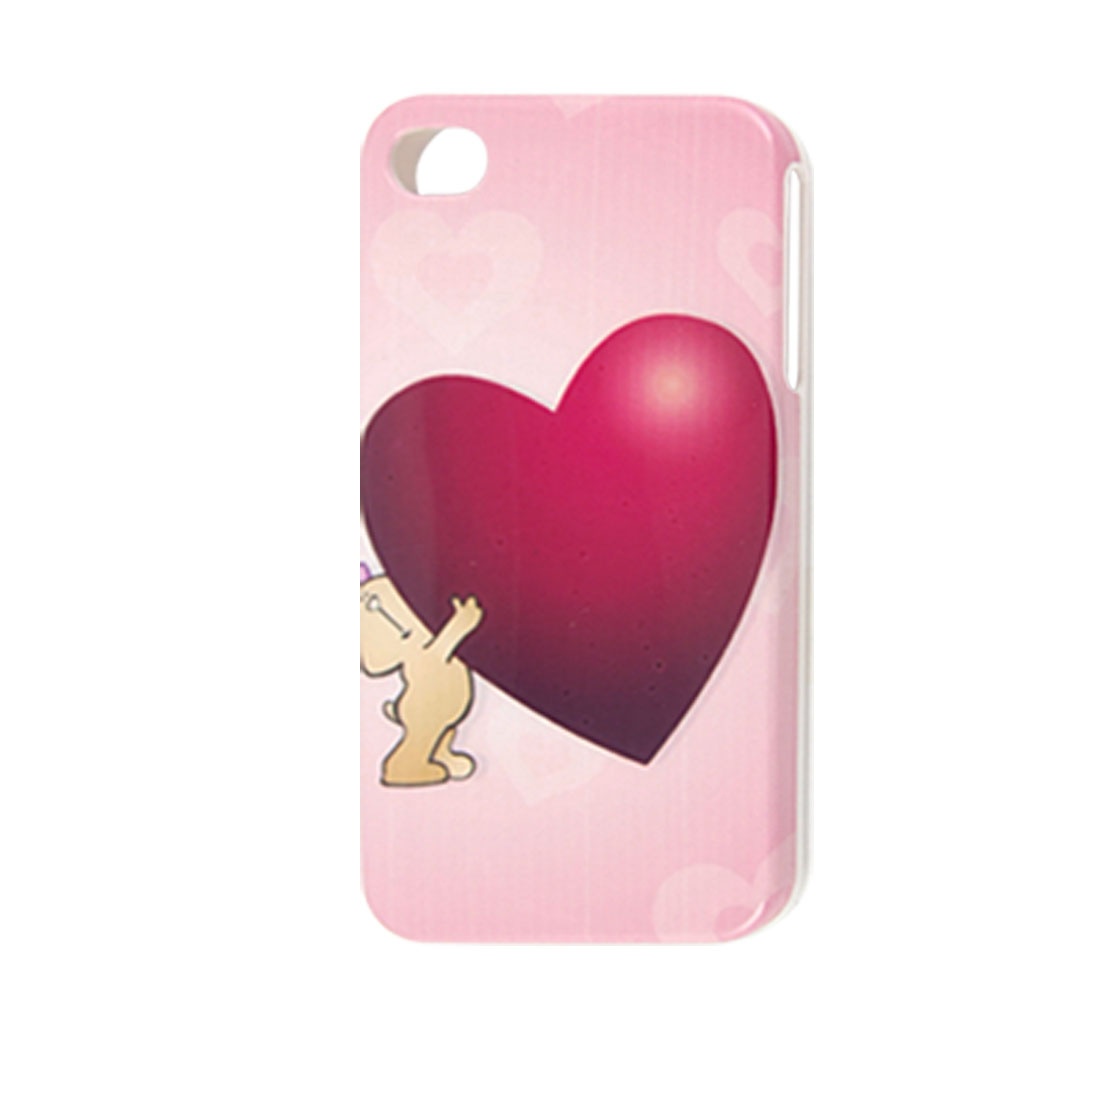 Burgundy Heart Prints Pink IMD Hard Plastic Back Case for iPhone 4 4G